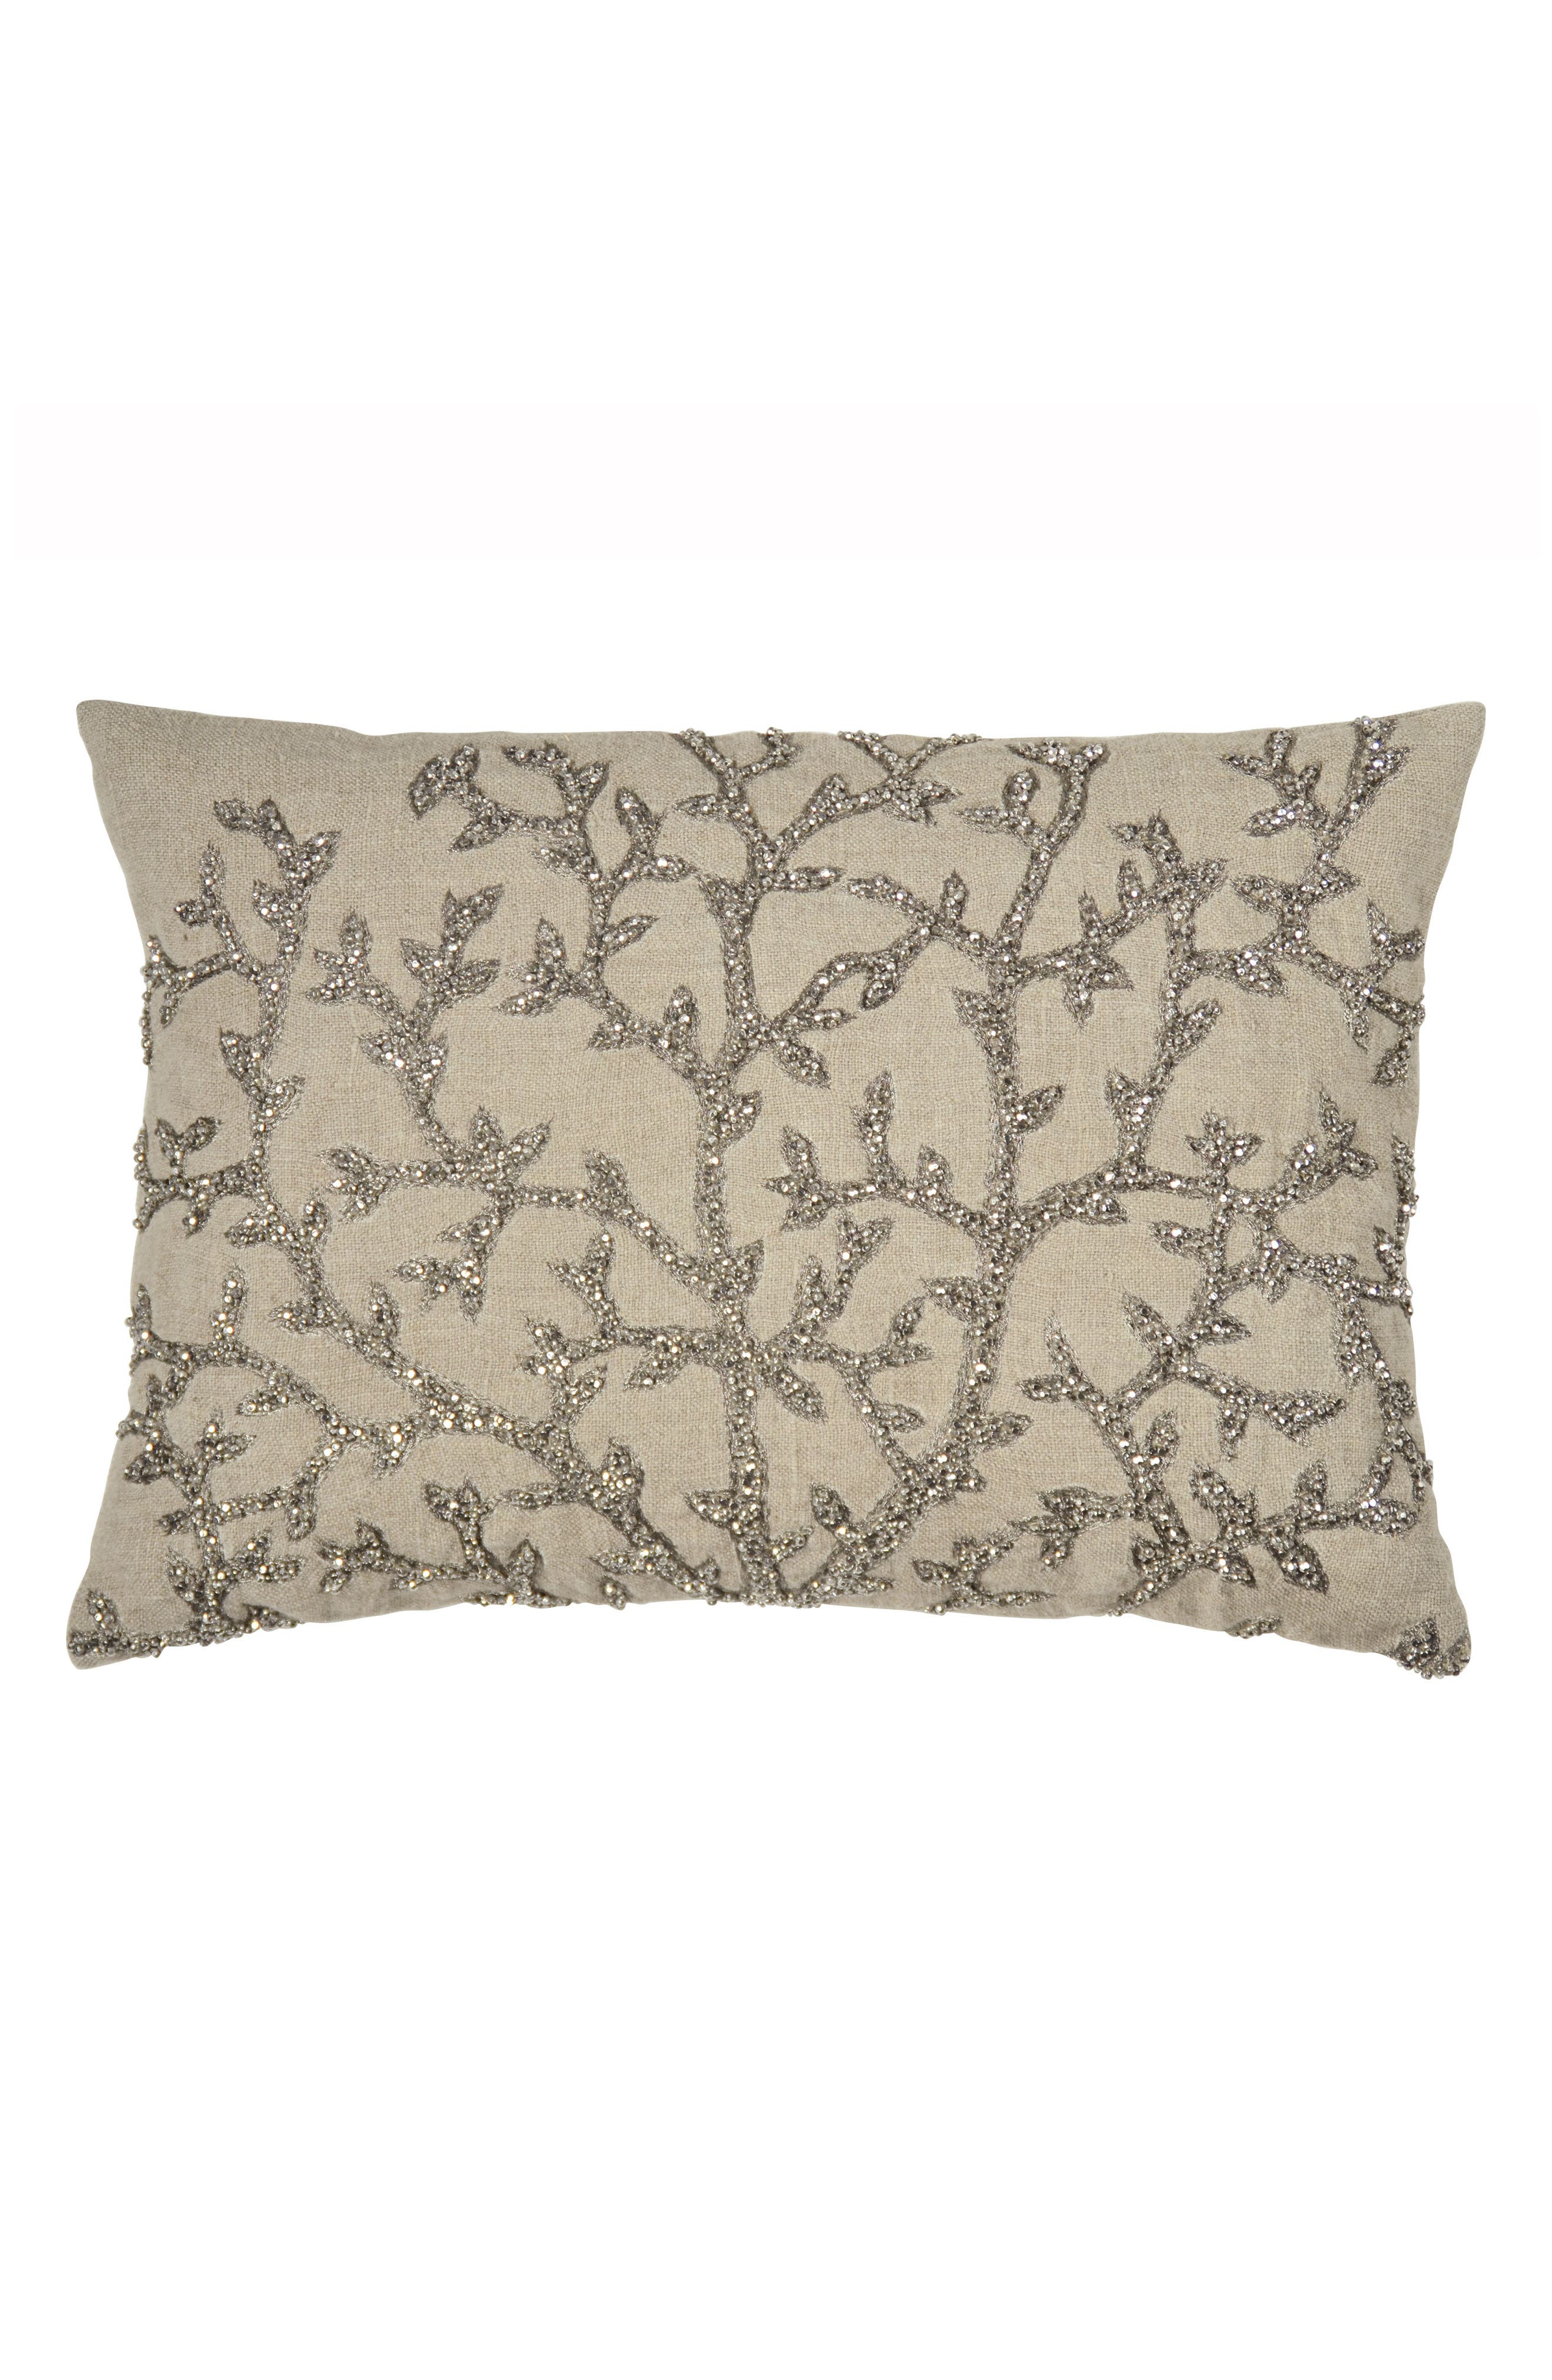 Michael Aram Tree of Life Beaded Accent Pillow